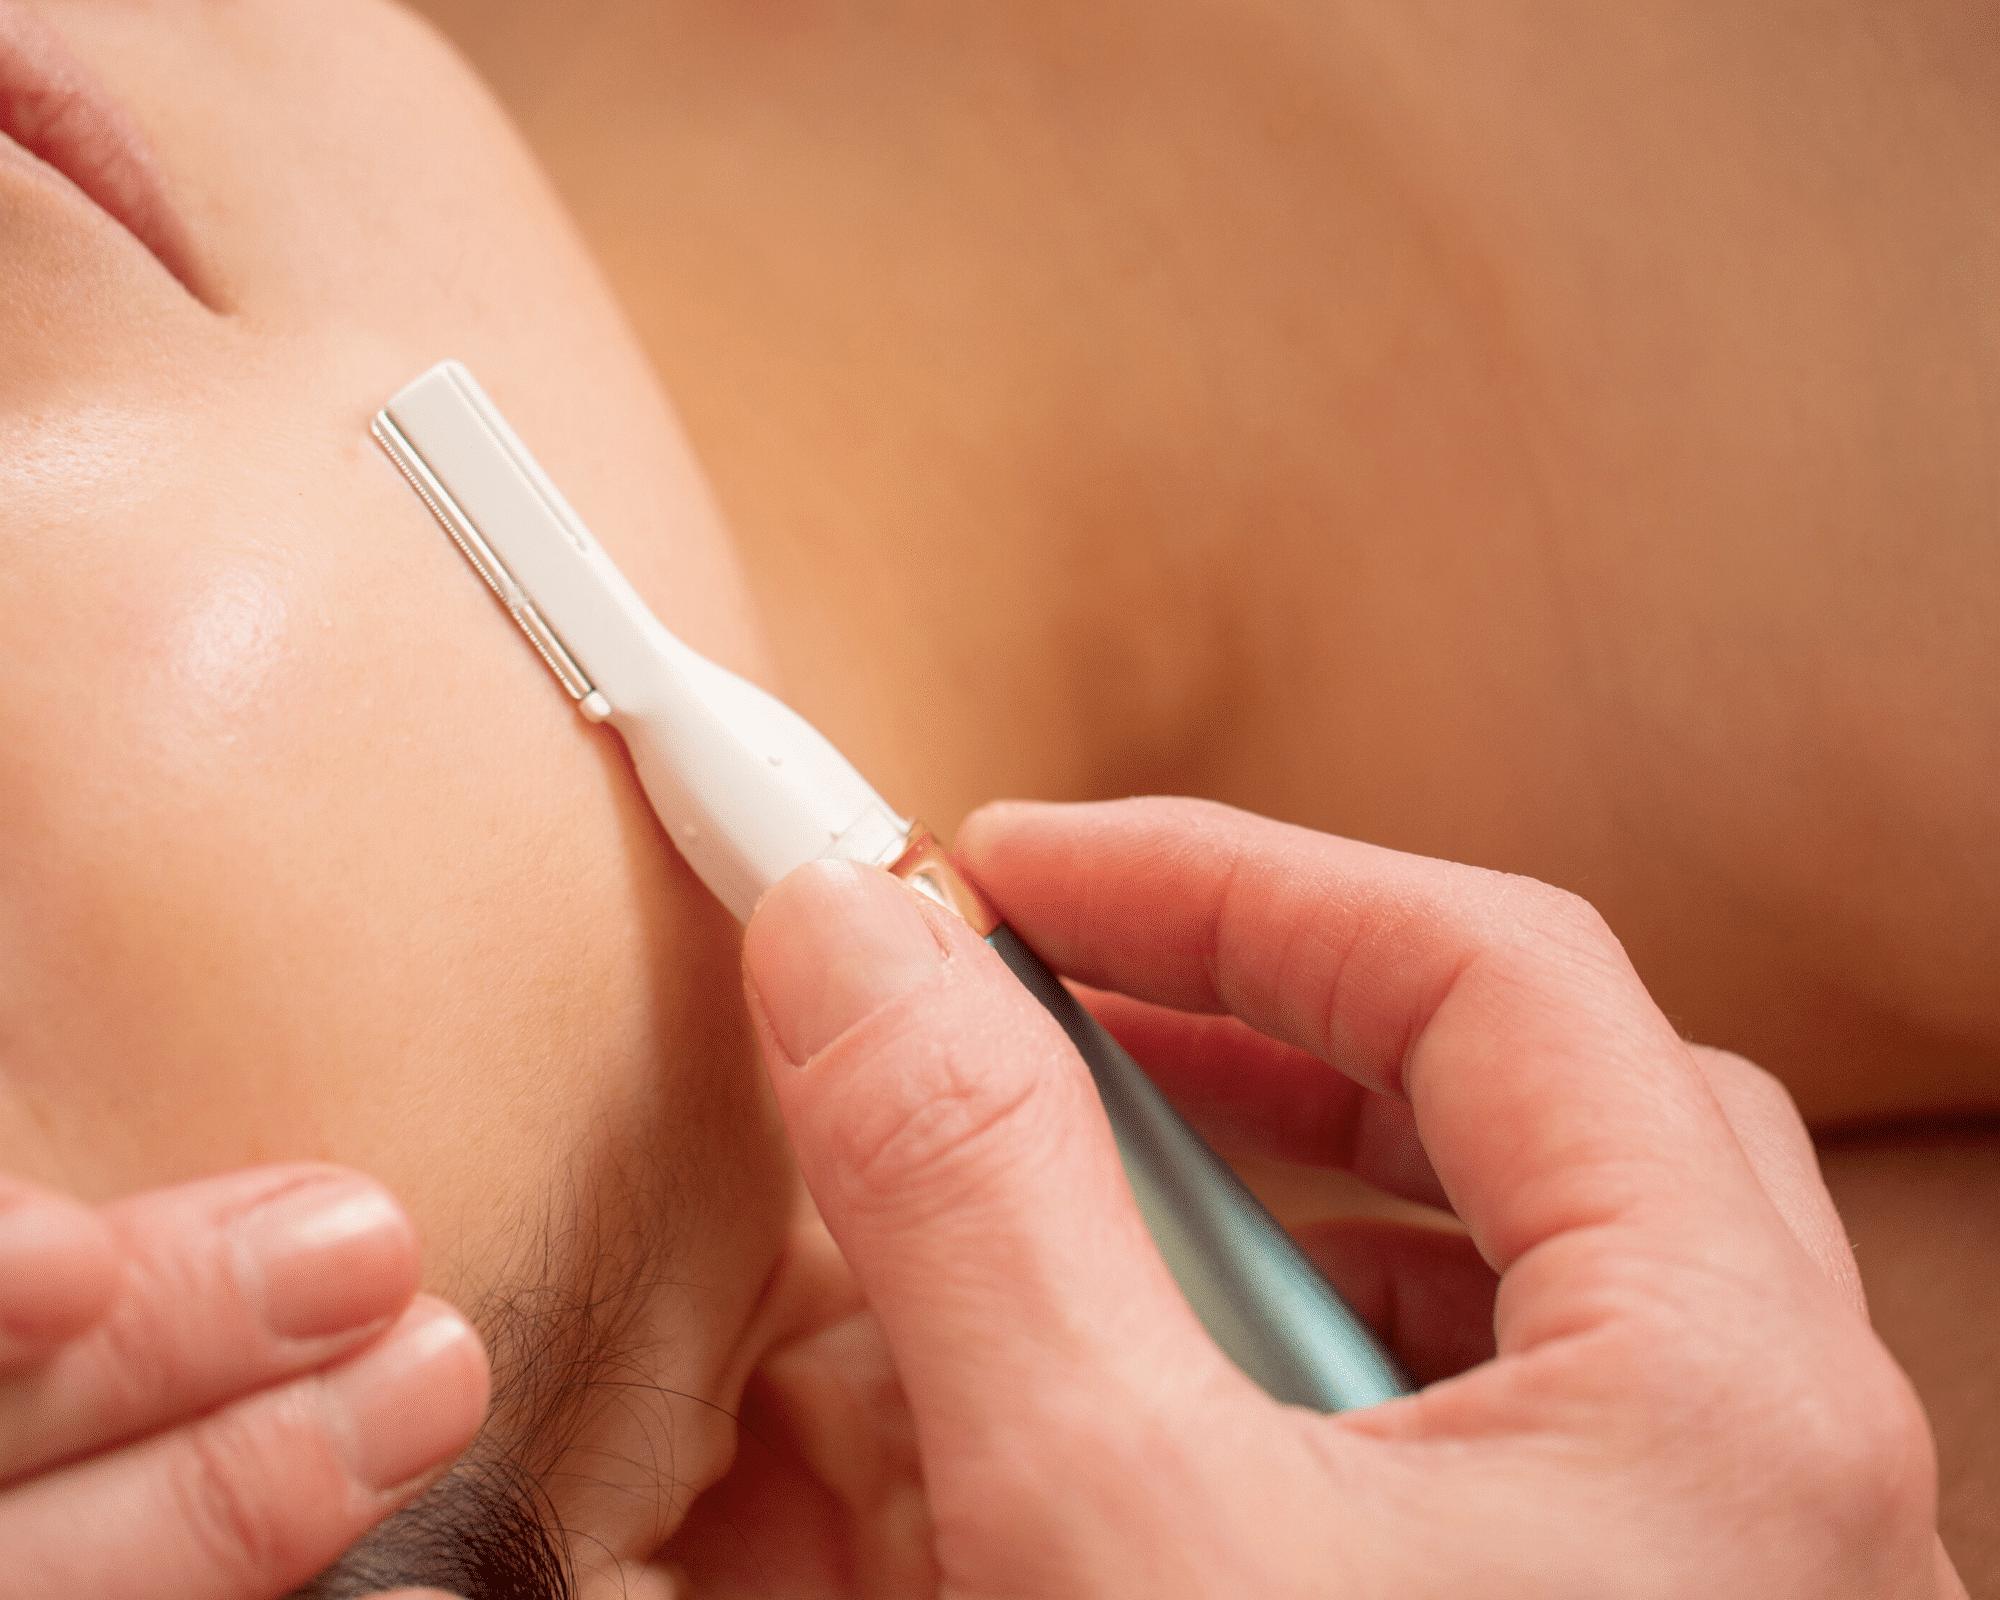 small razor shaving woman's face